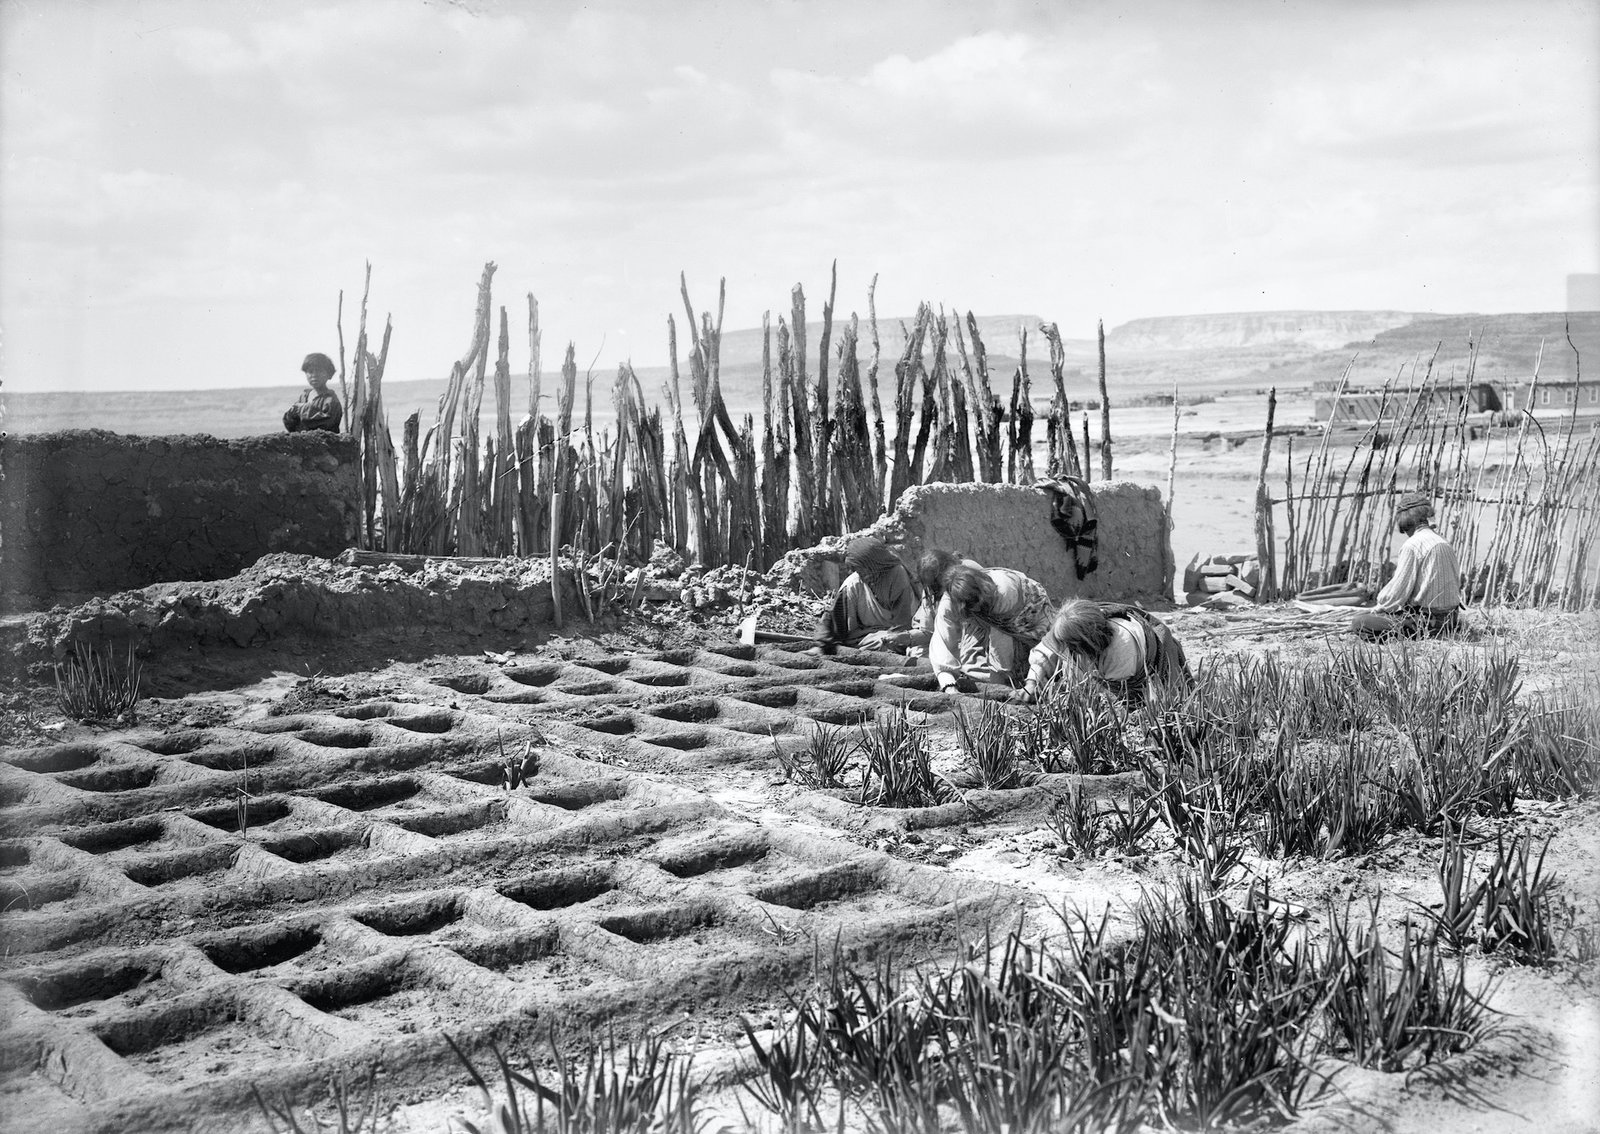 waffle-gardens-at-zuni-pueblo-in-new-mexico-circa-1910-1925